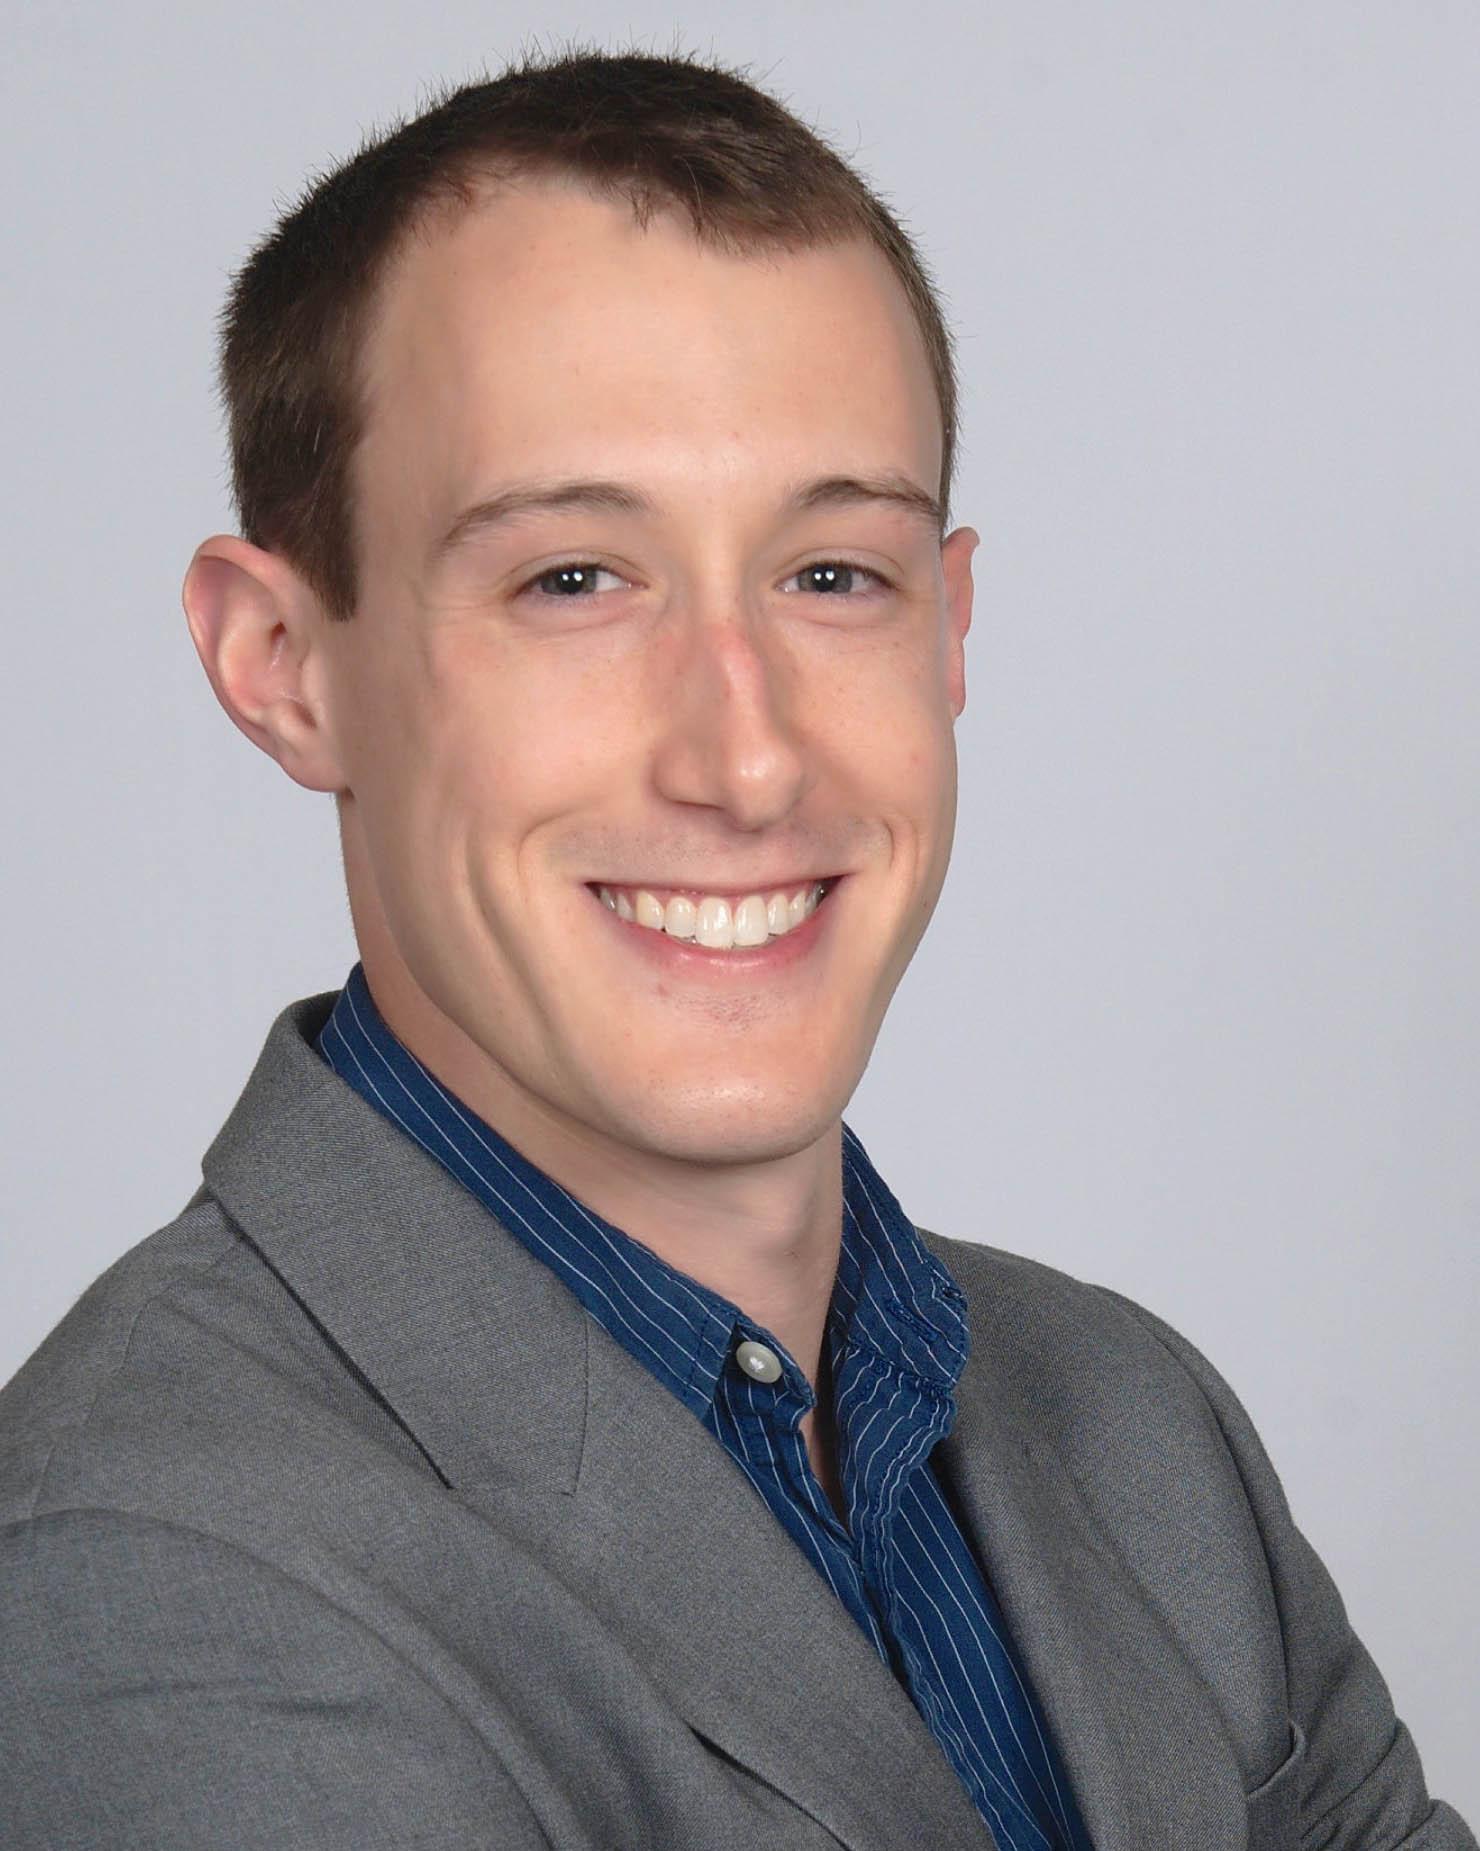 David Body, DMD | Dental One Associates of Pikesville